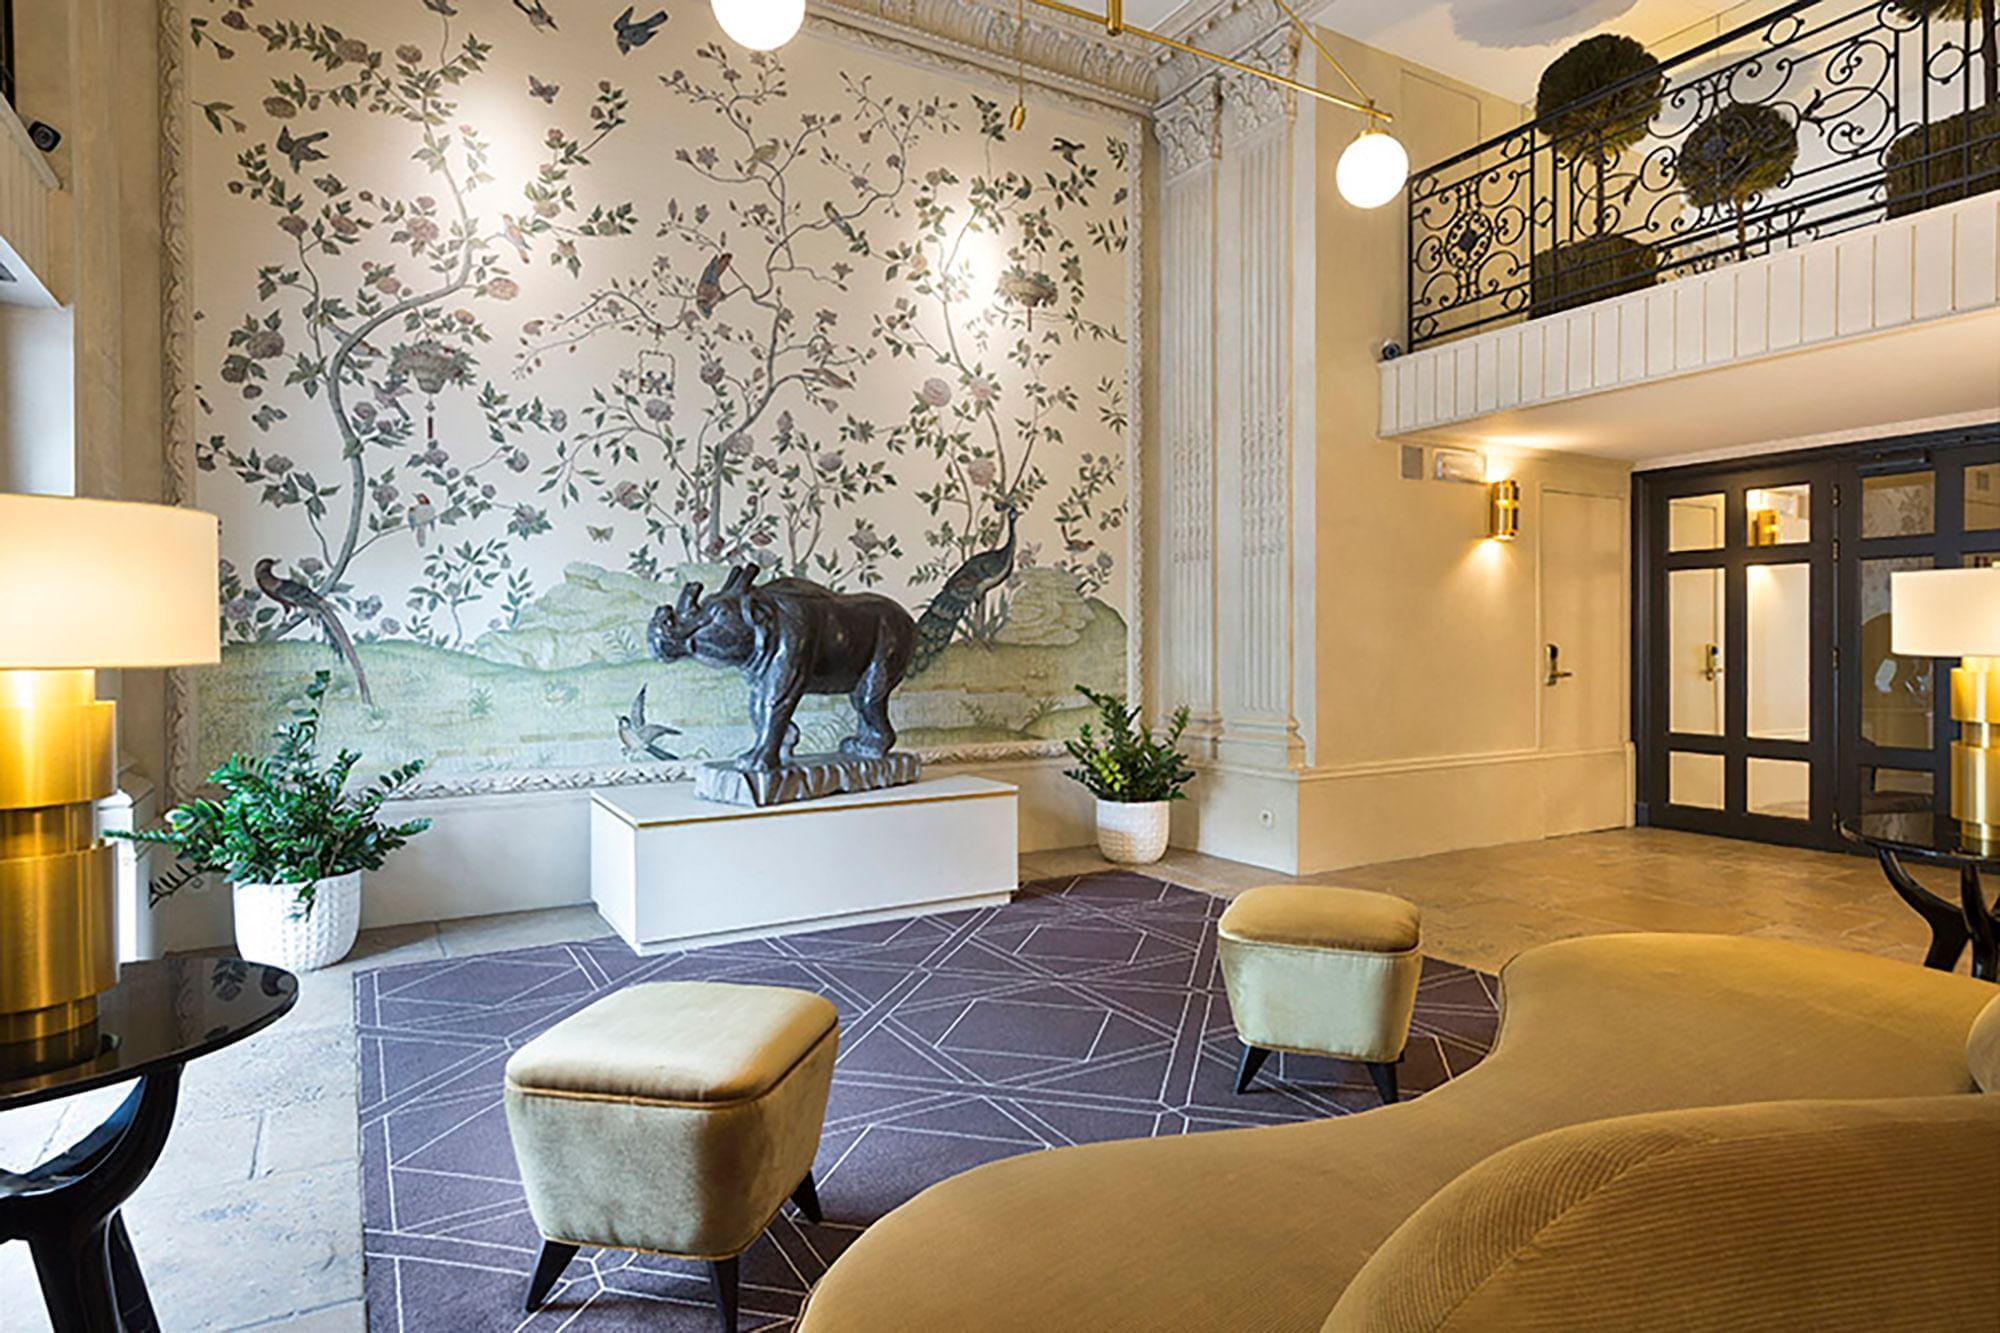 Entrance at Hotel Barsey by Warwick